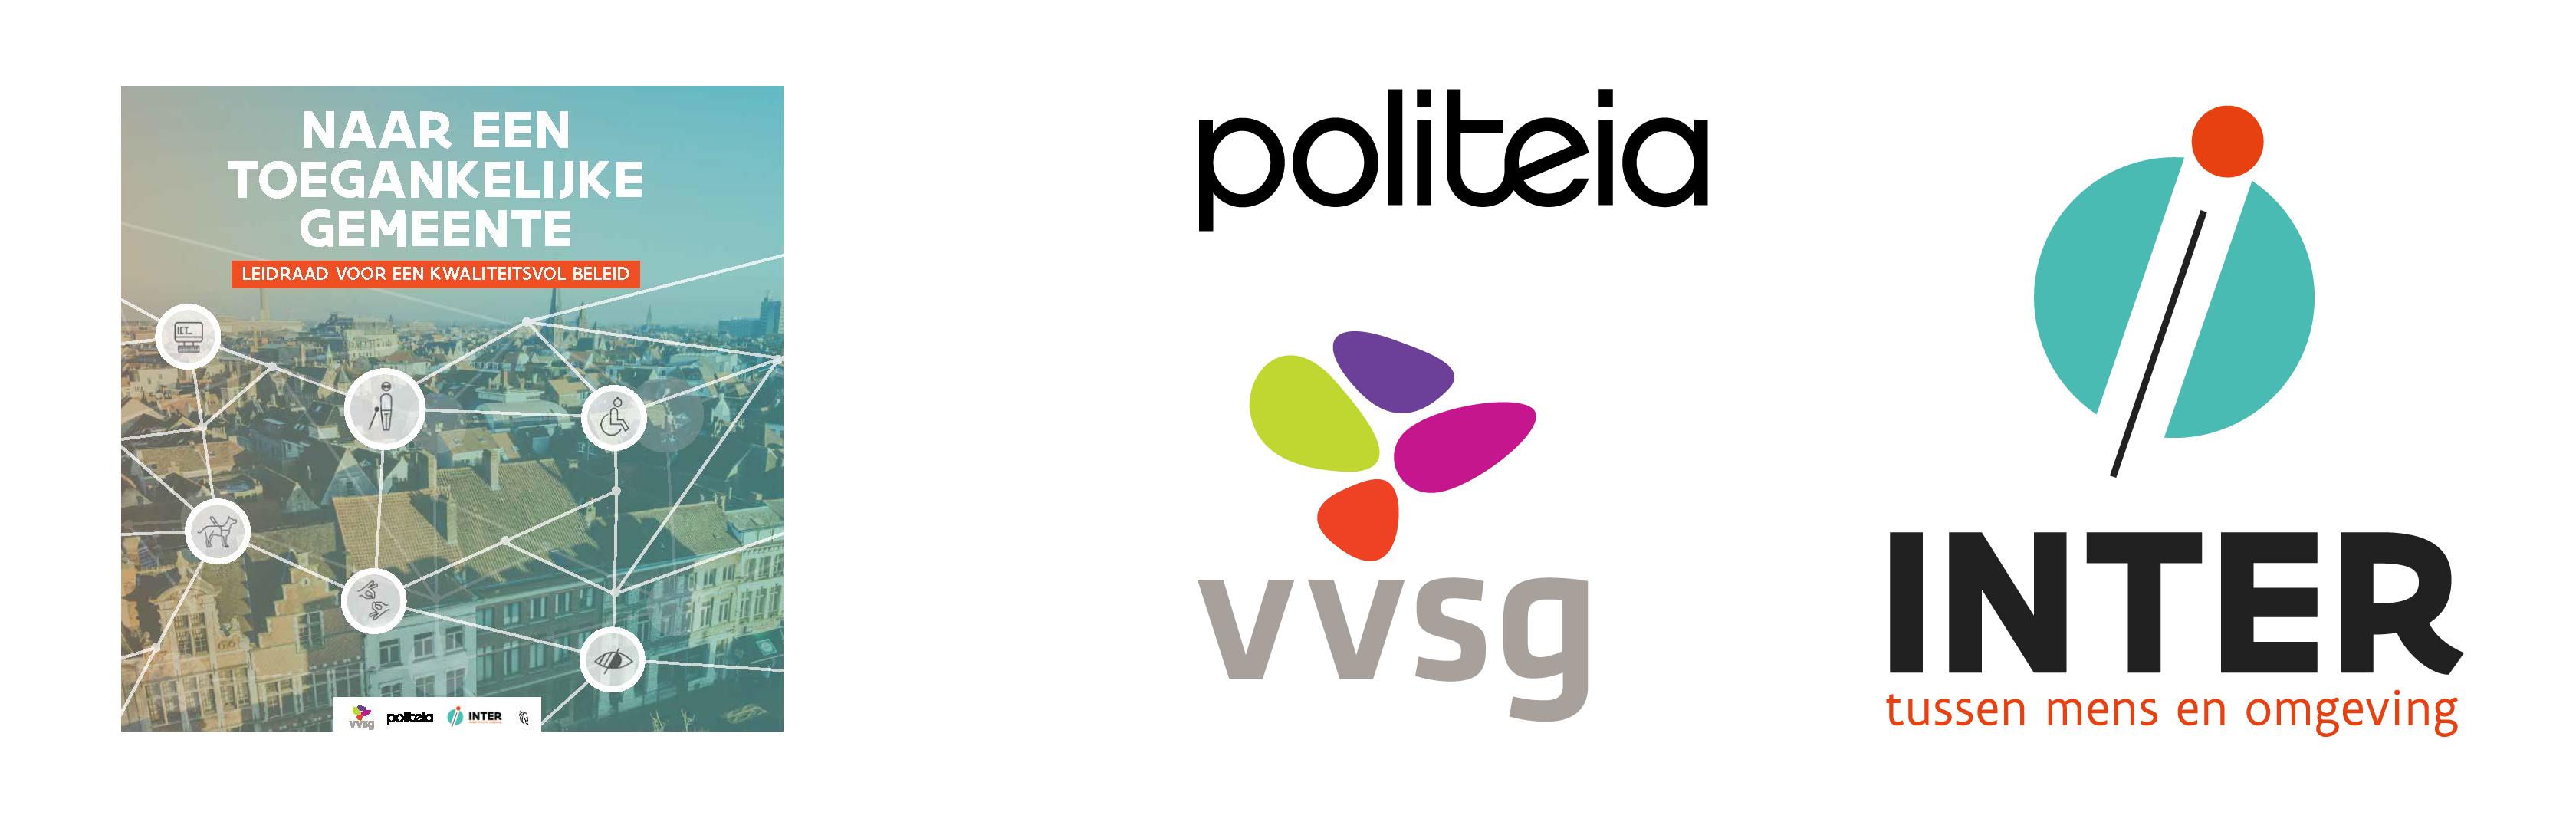 cover publicatie en logo's Politeia, VVSG en Inter